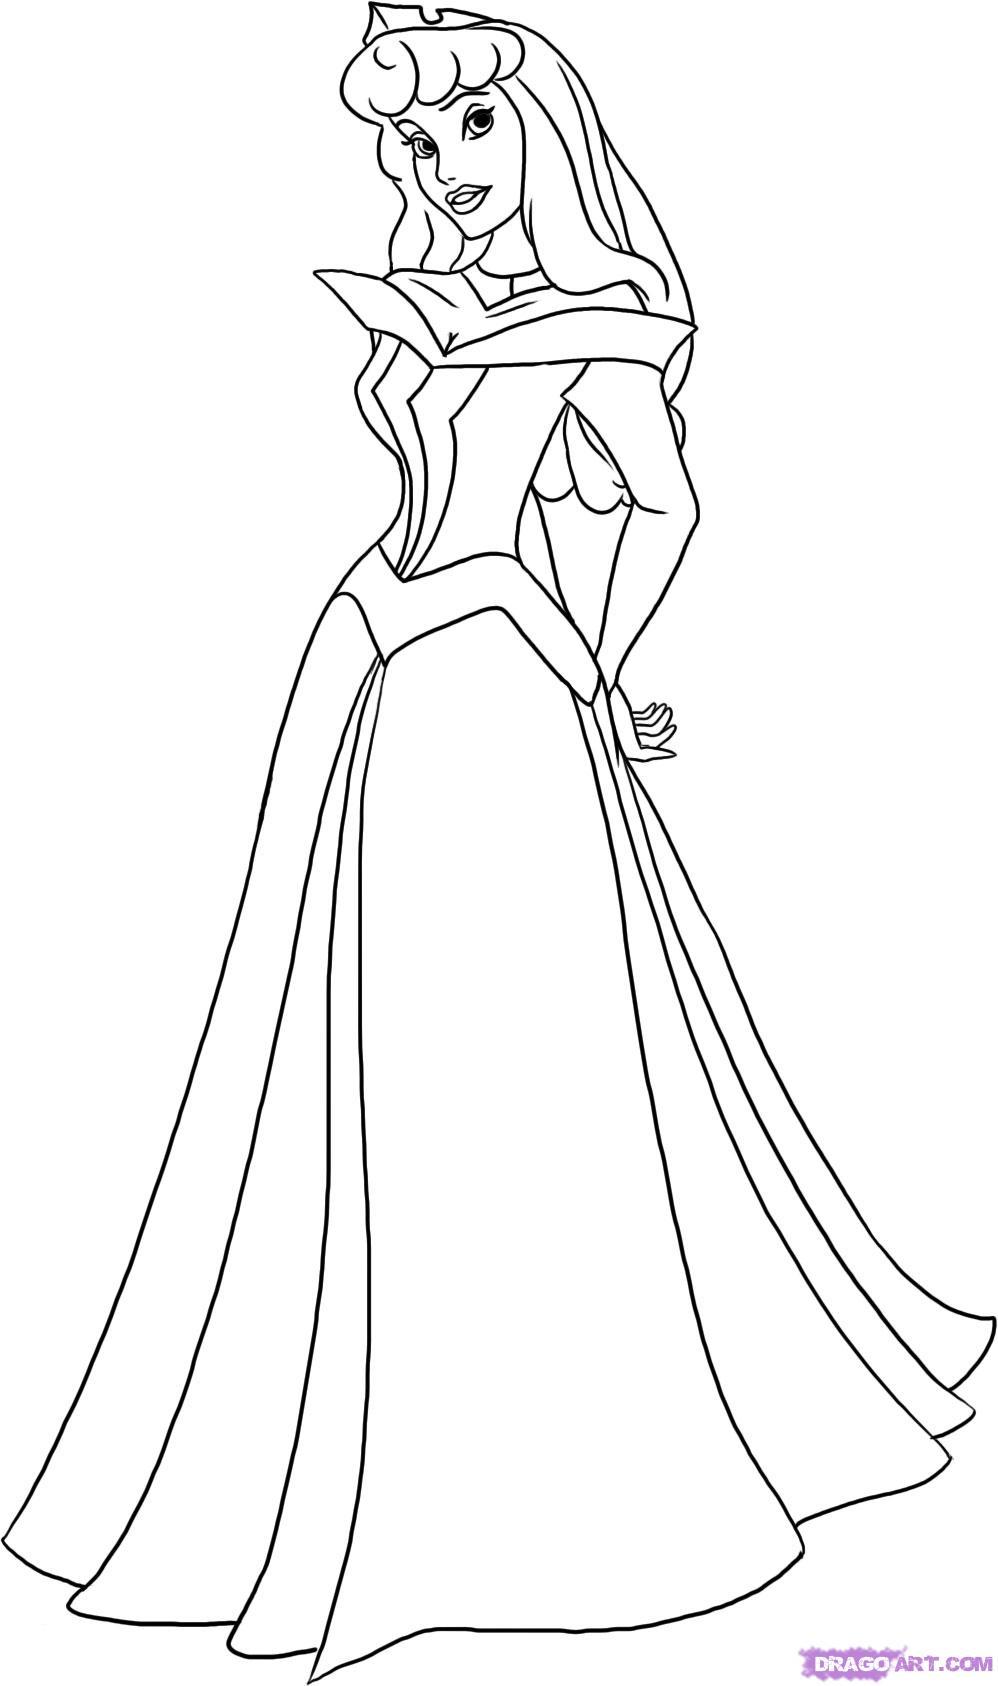 998x1686 Princess Drawings